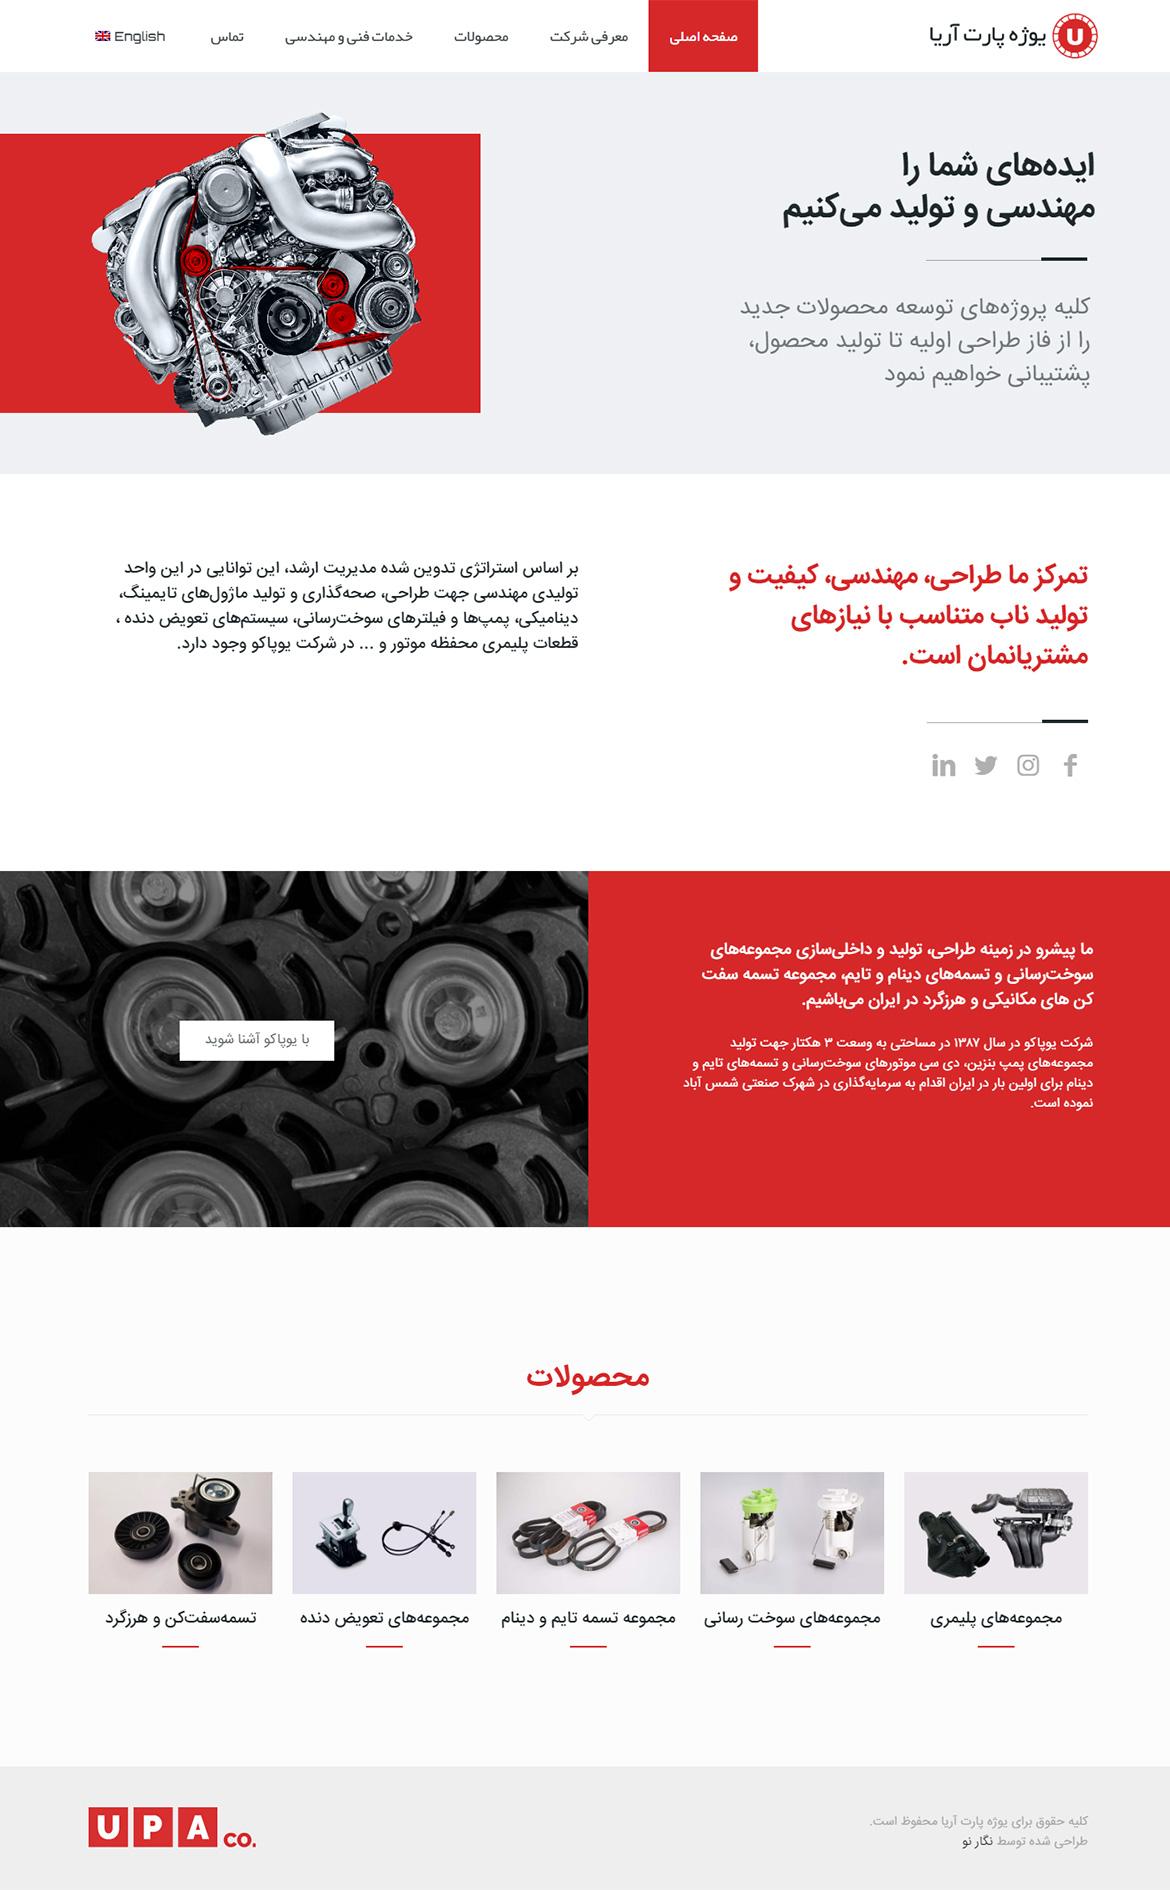 طراحی سایت یوژه پارت آریا